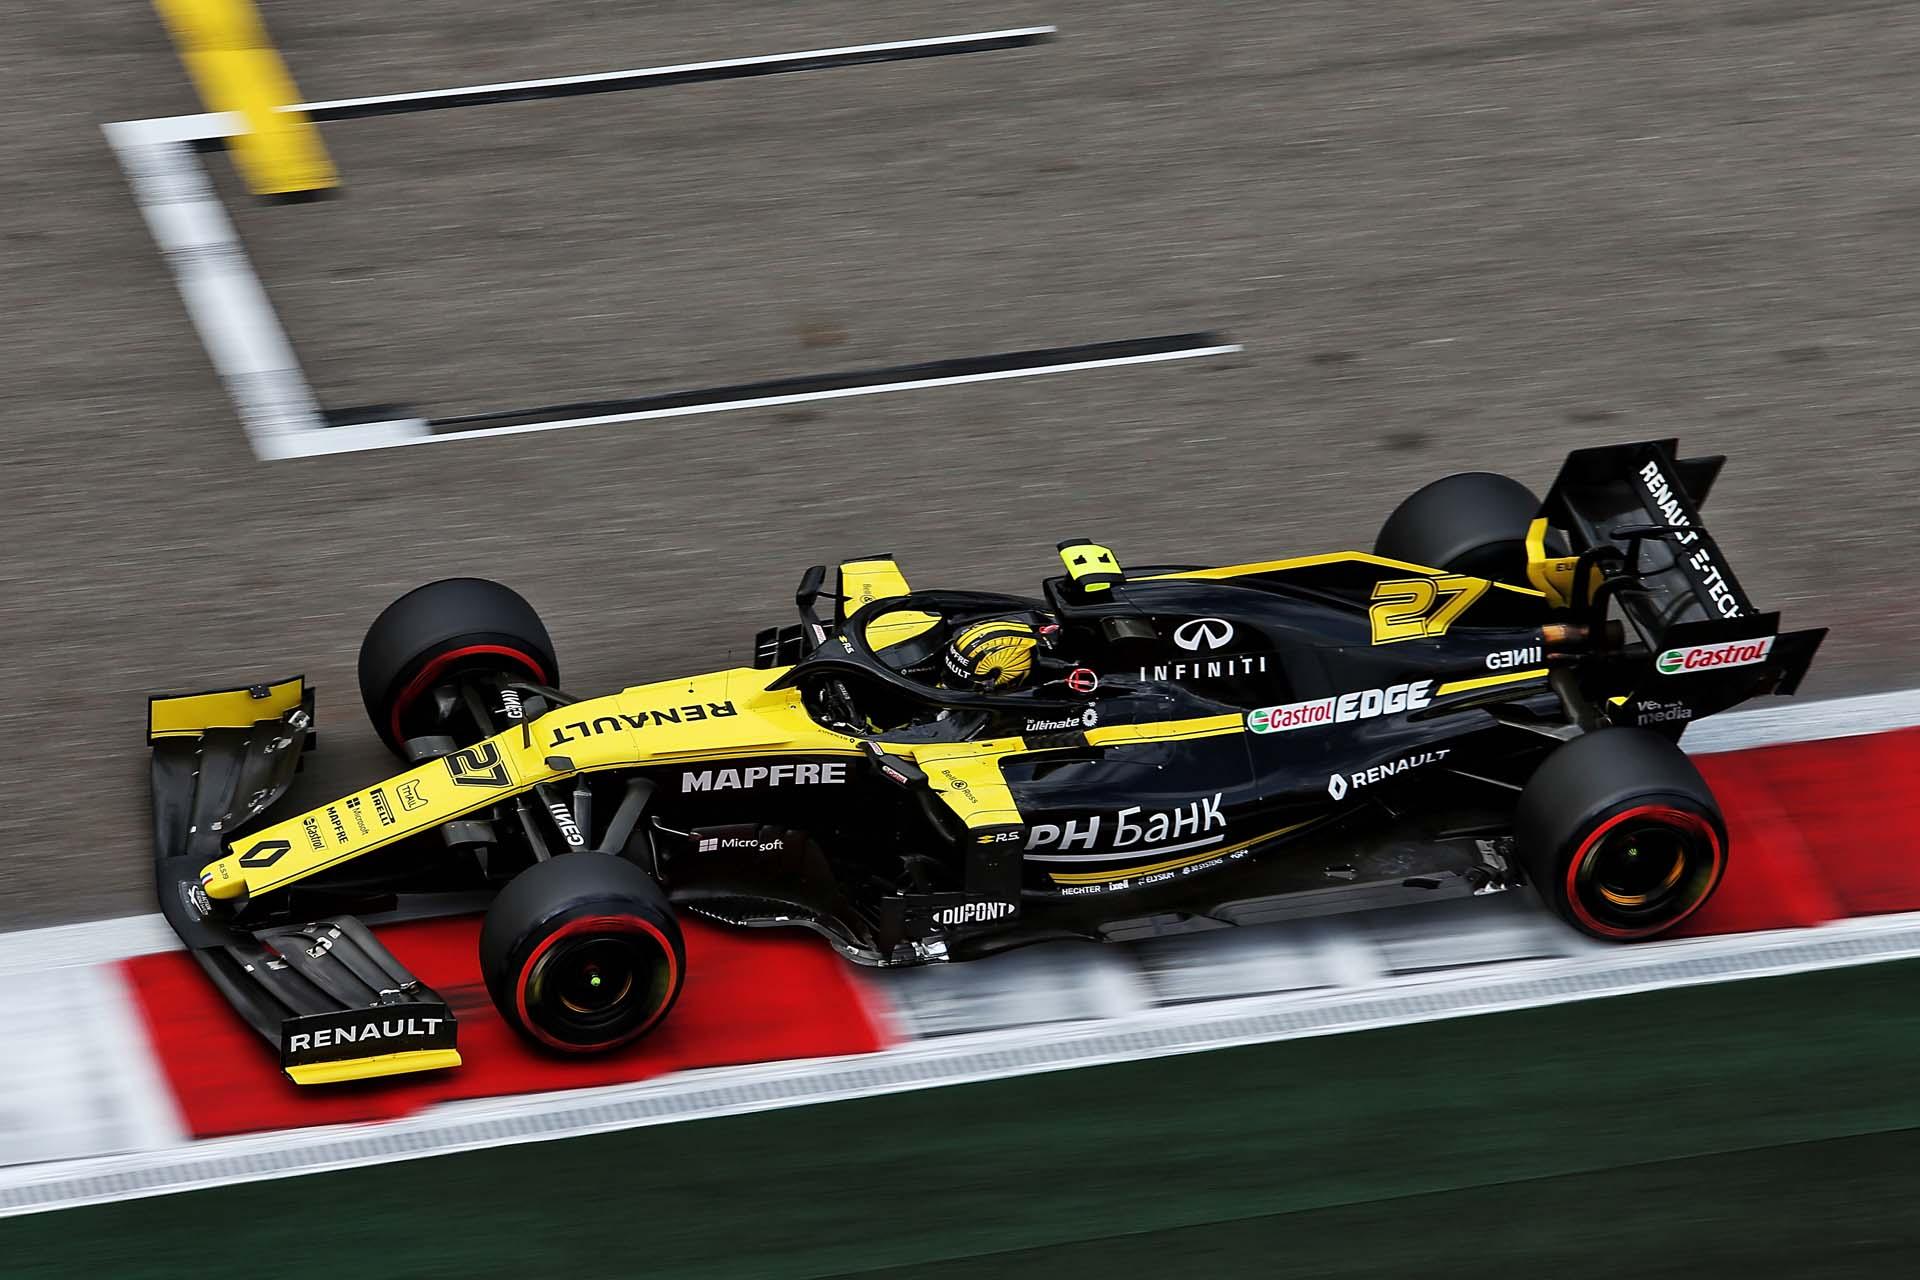 Motor Racing - Formula One World Championship - Russian Grand Prix - Qualifying Day - Sochi, Russia